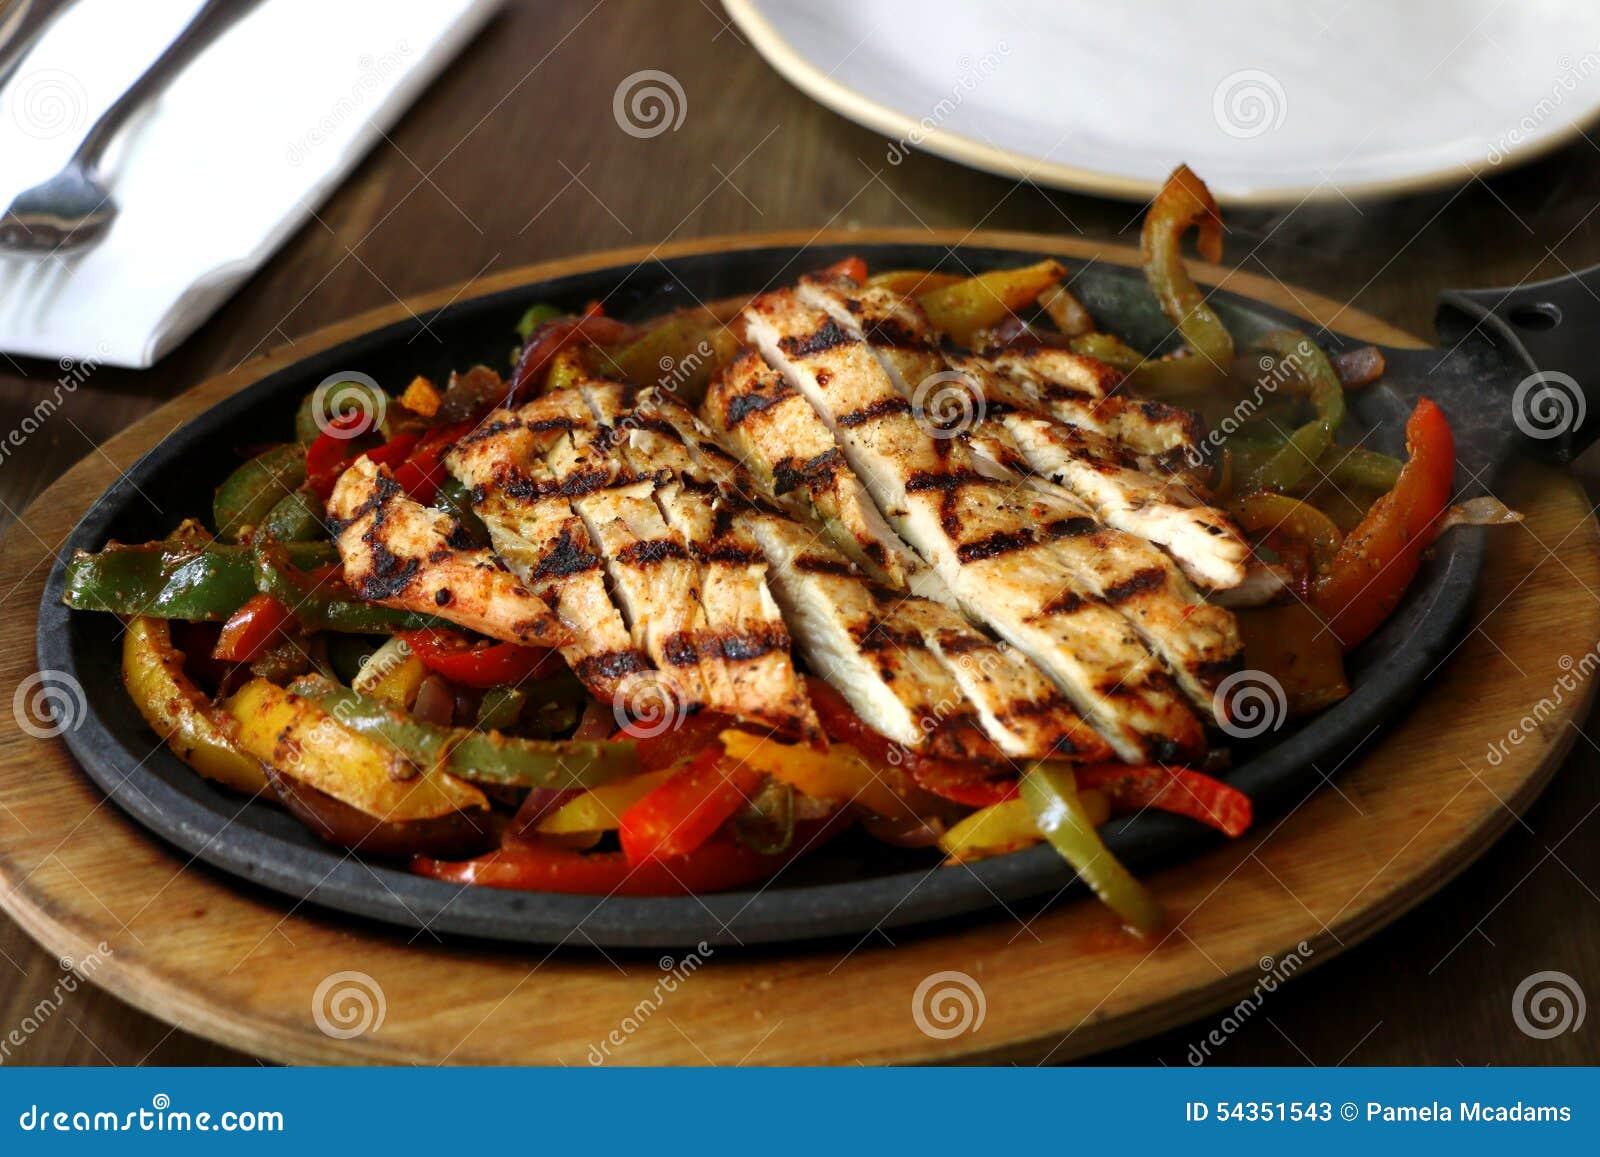 Nourriture mexicaine photo stock image 54351543 - Cuisine mexicaine fajitas ...